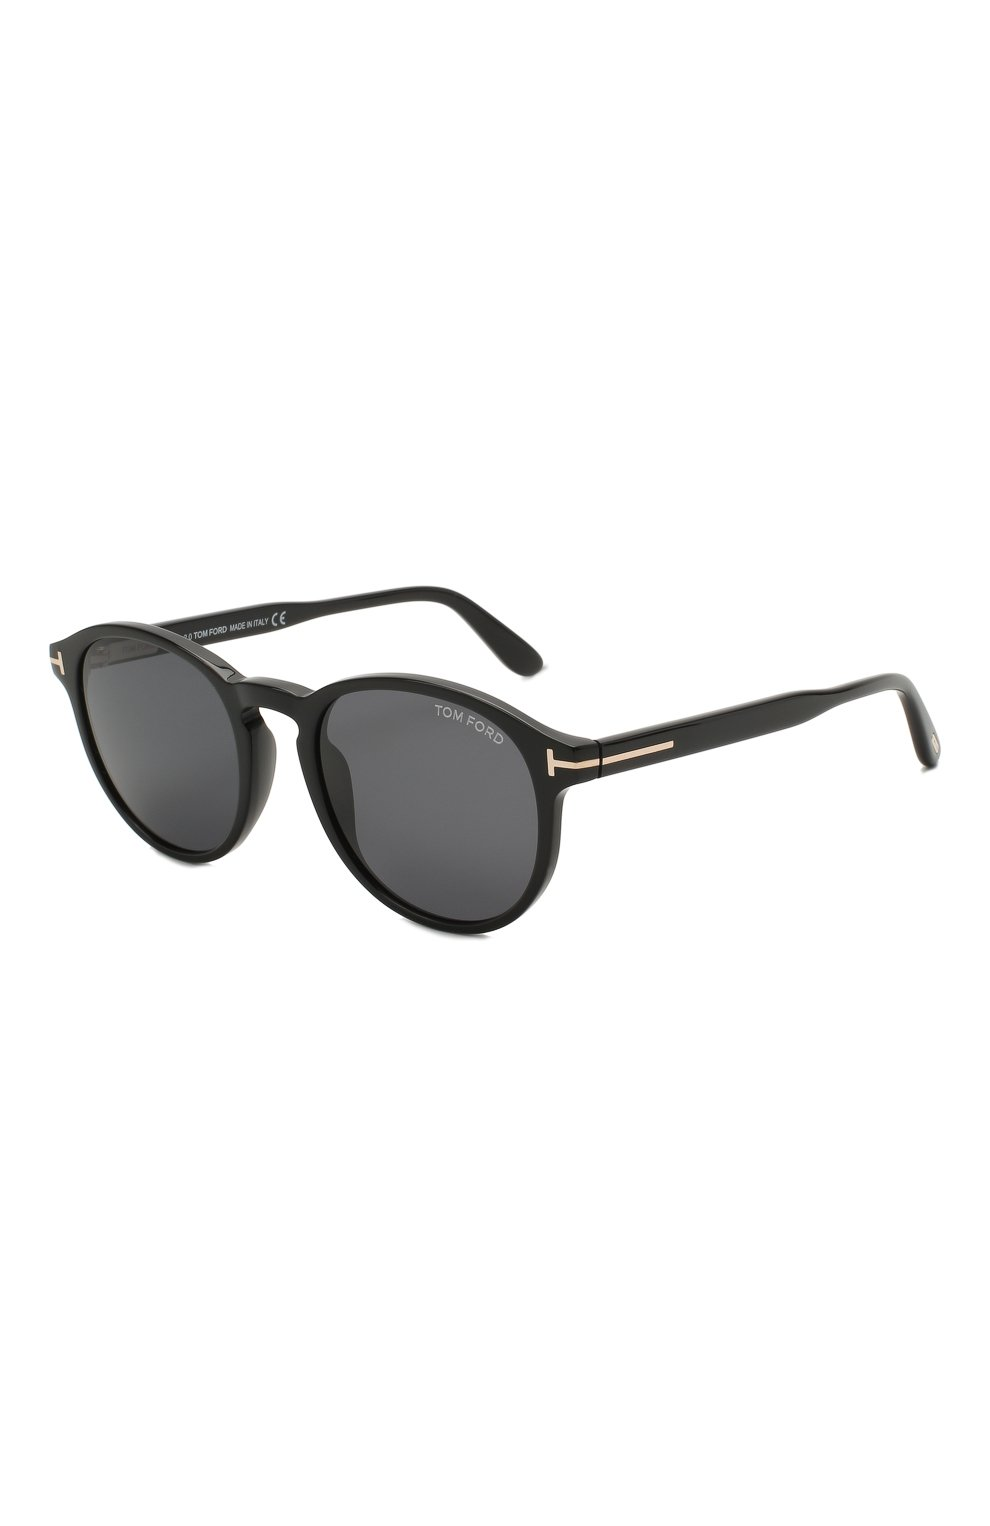 Мужские солнцезащитные очки TOM FORD черного цвета, арт. TF834 01A | Фото 1